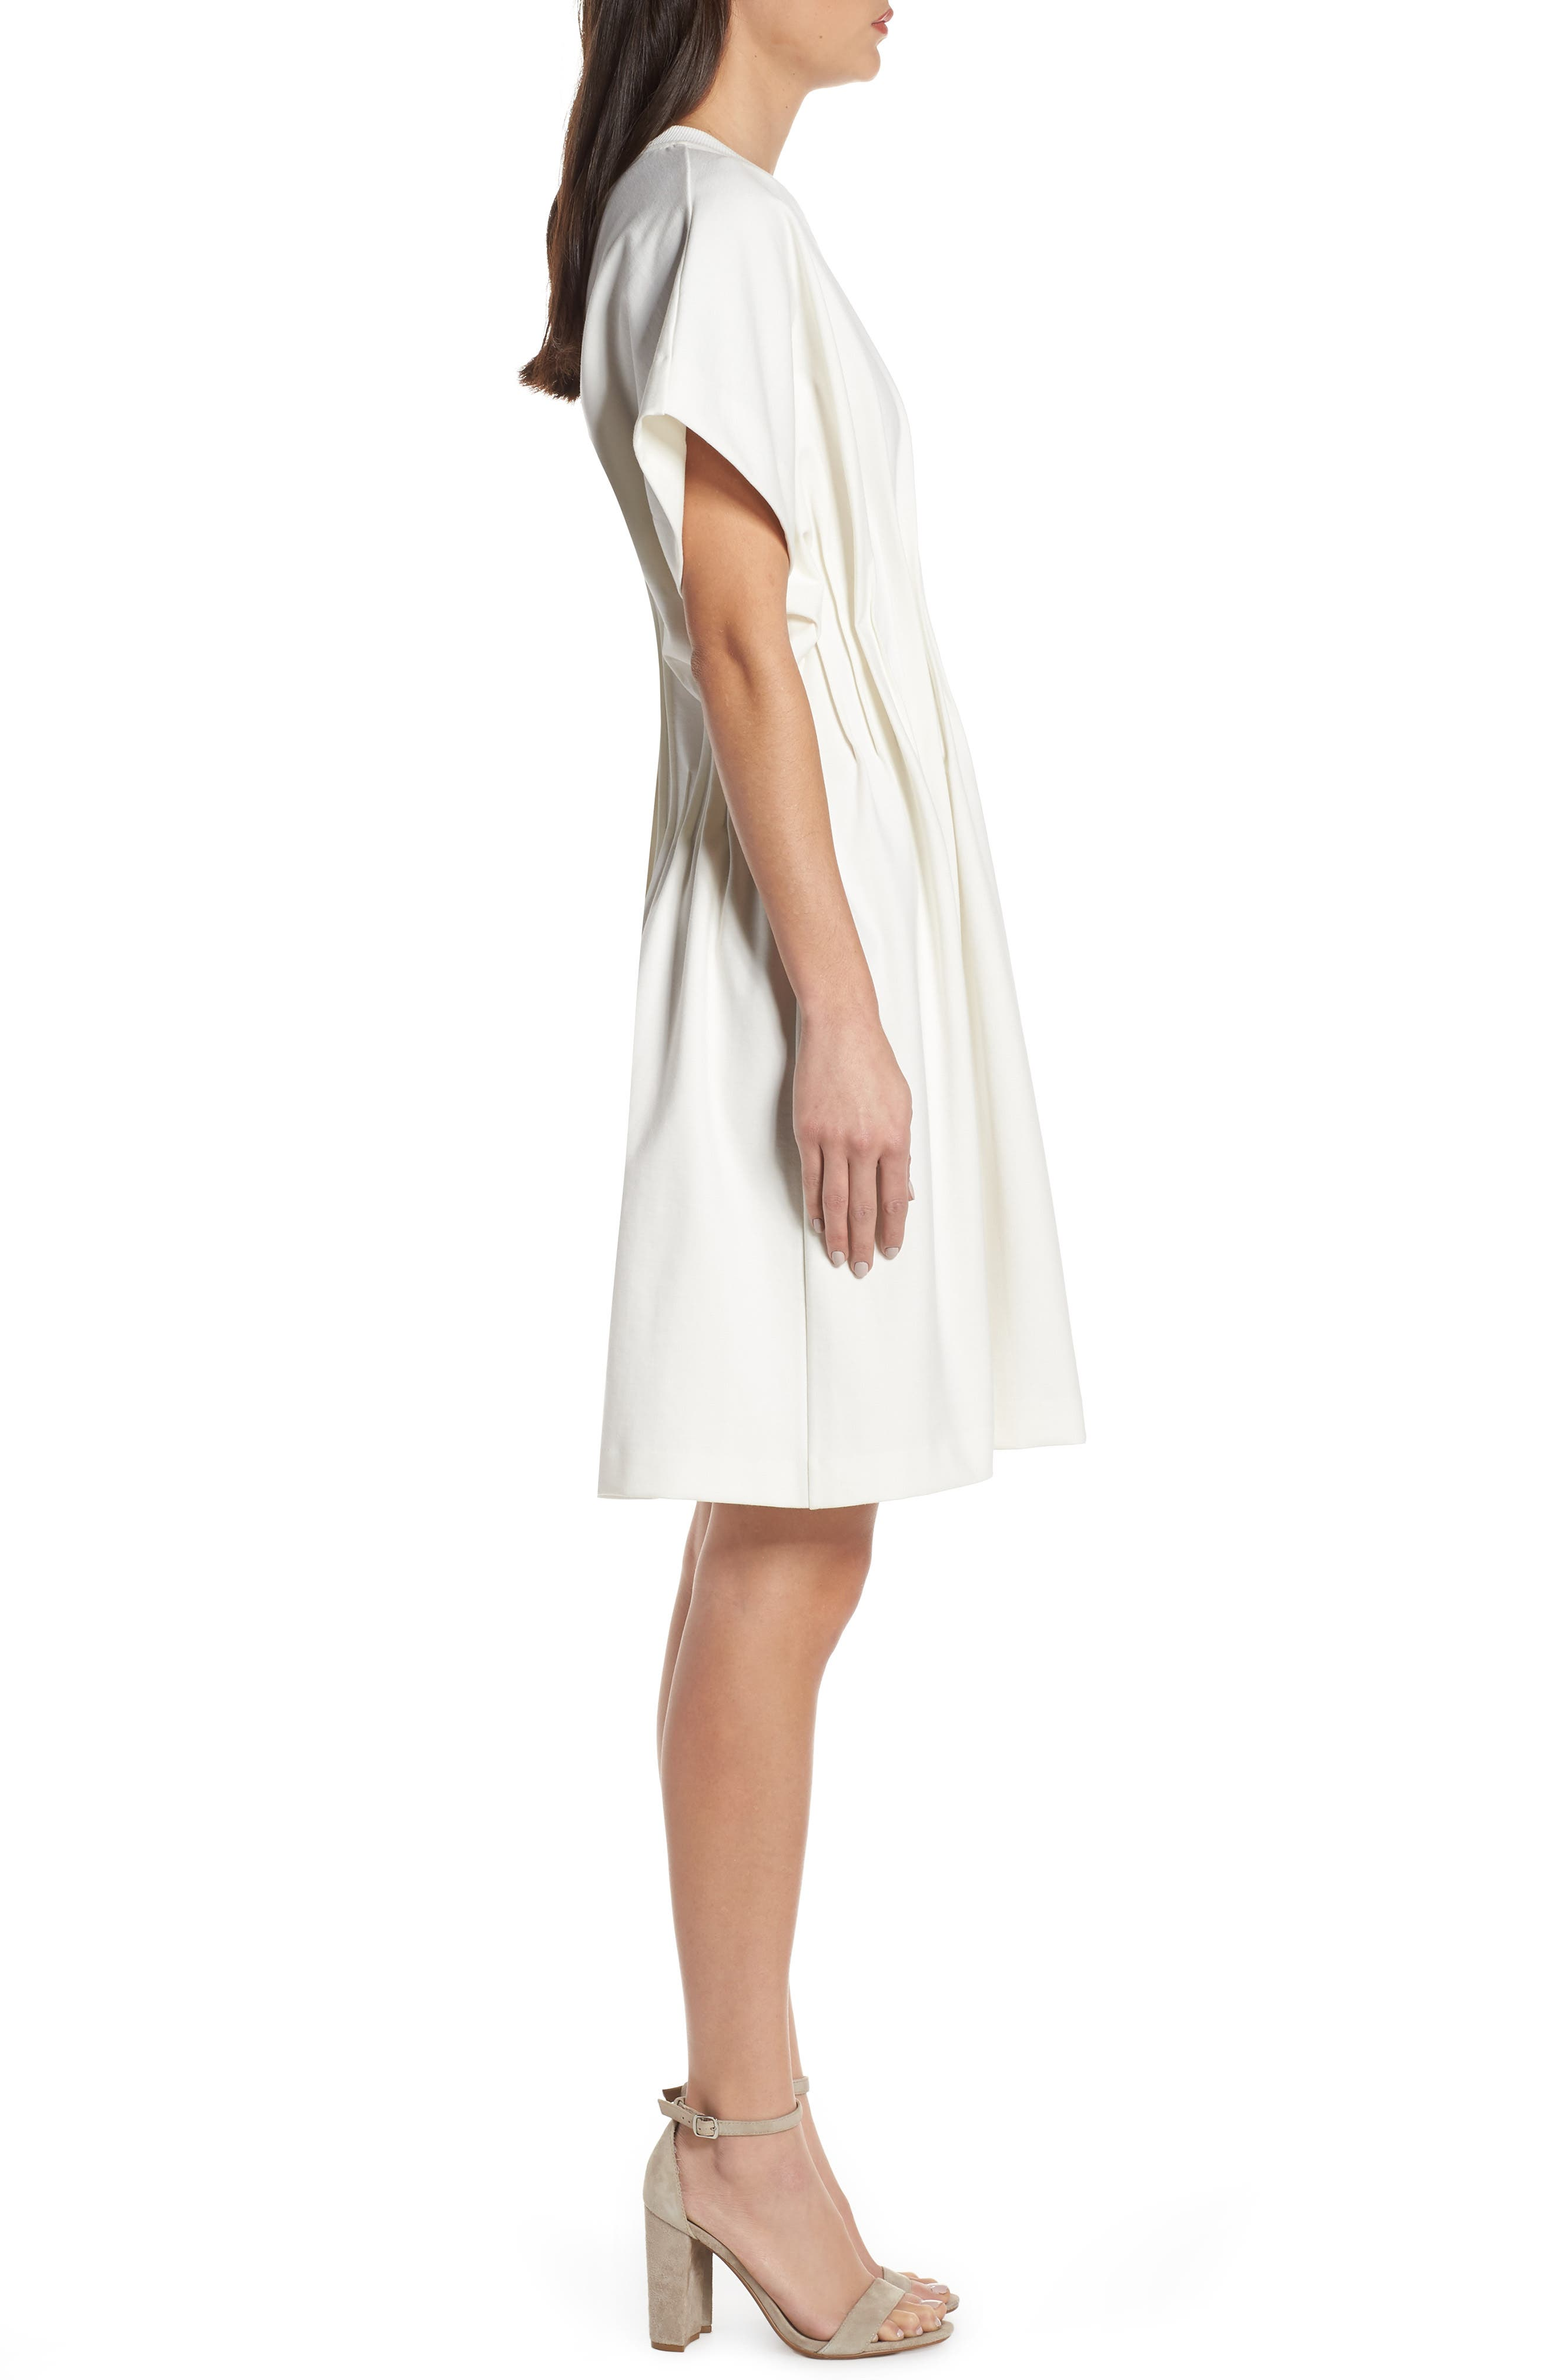 CAARA, Looma T-Shirt Dress, Alternate thumbnail 4, color, WHITE